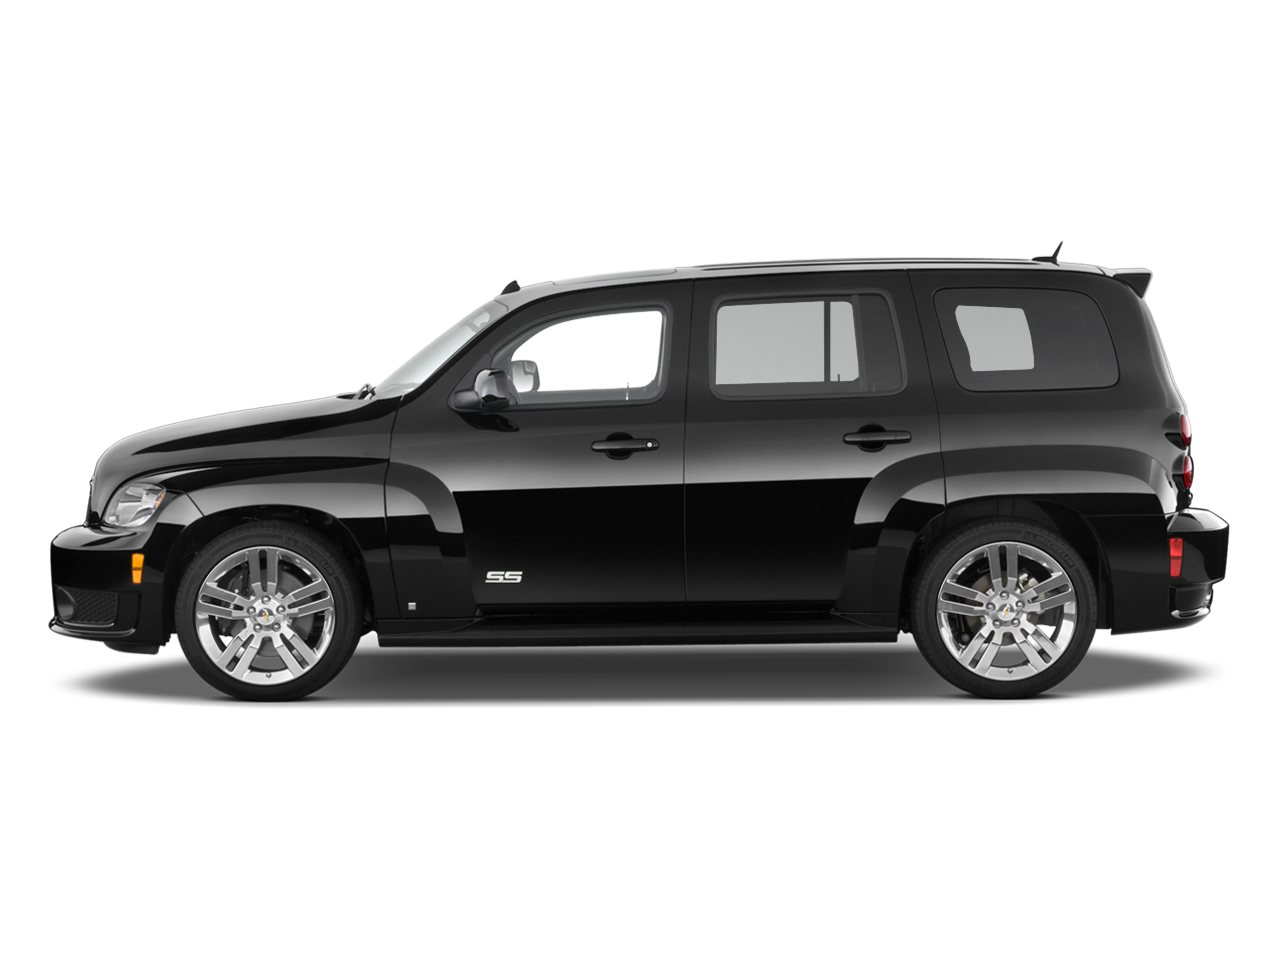 2009 chevrolet hhr panel lt chevy wagon review automobile magazine. Black Bedroom Furniture Sets. Home Design Ideas